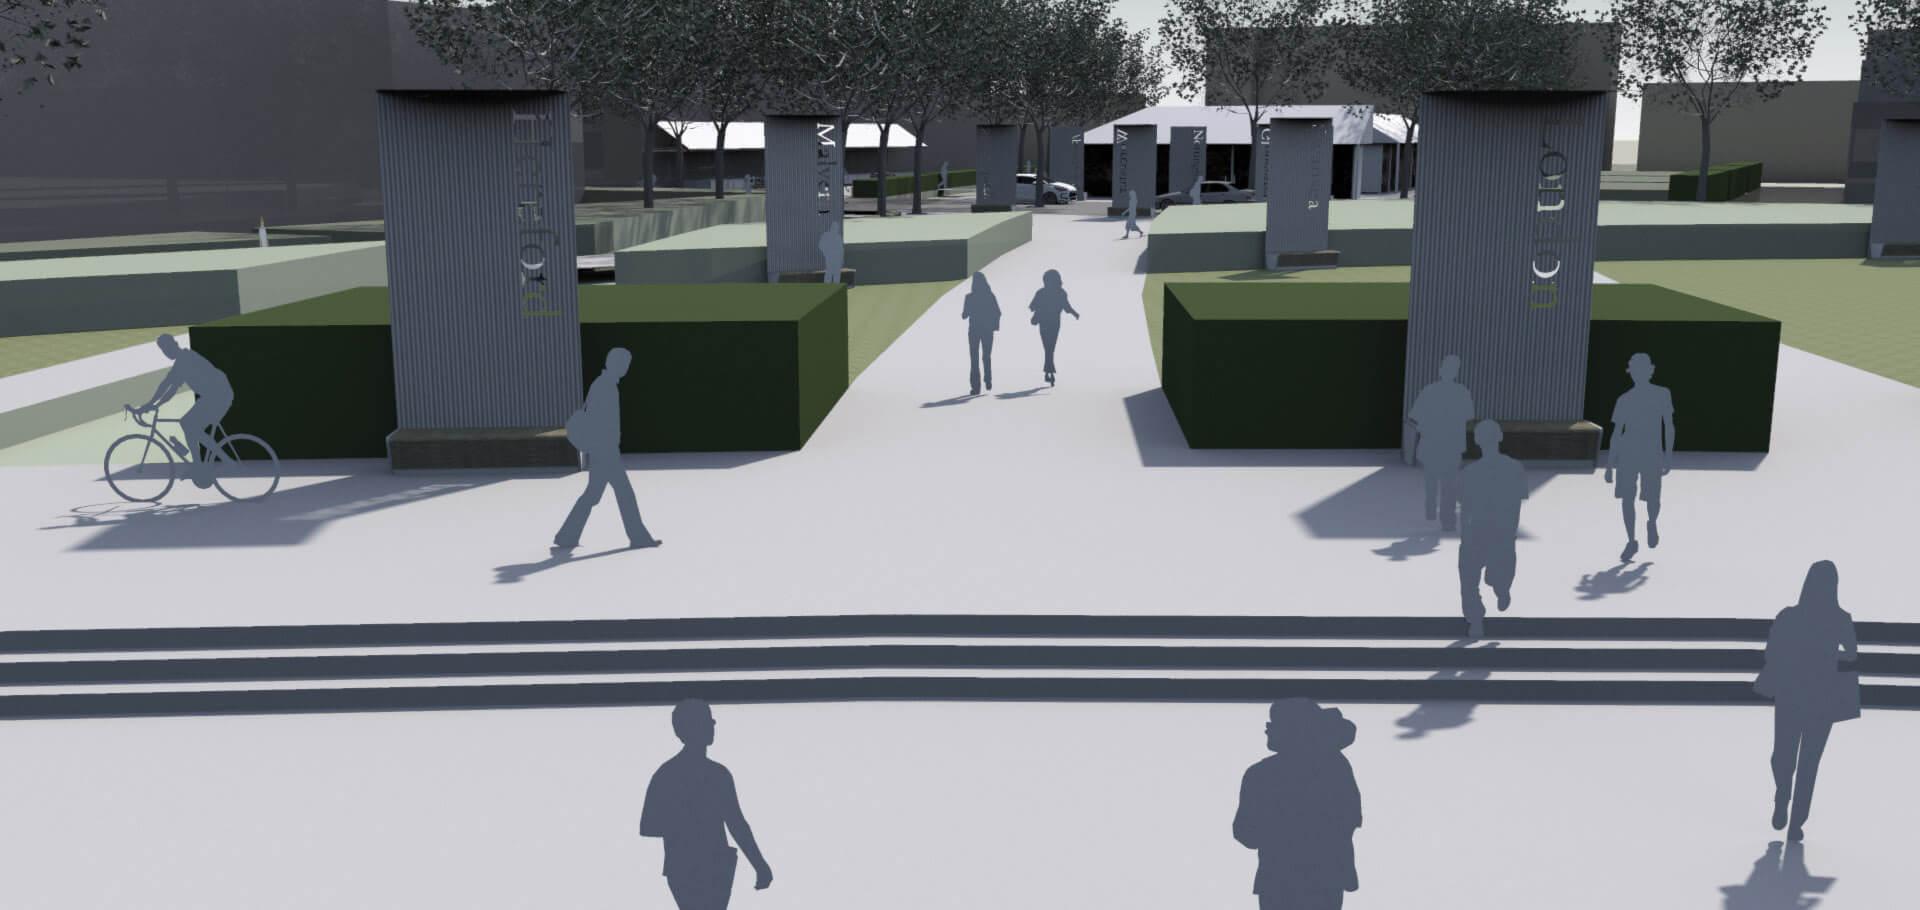 A thriving urban transport hub in Cheltenham